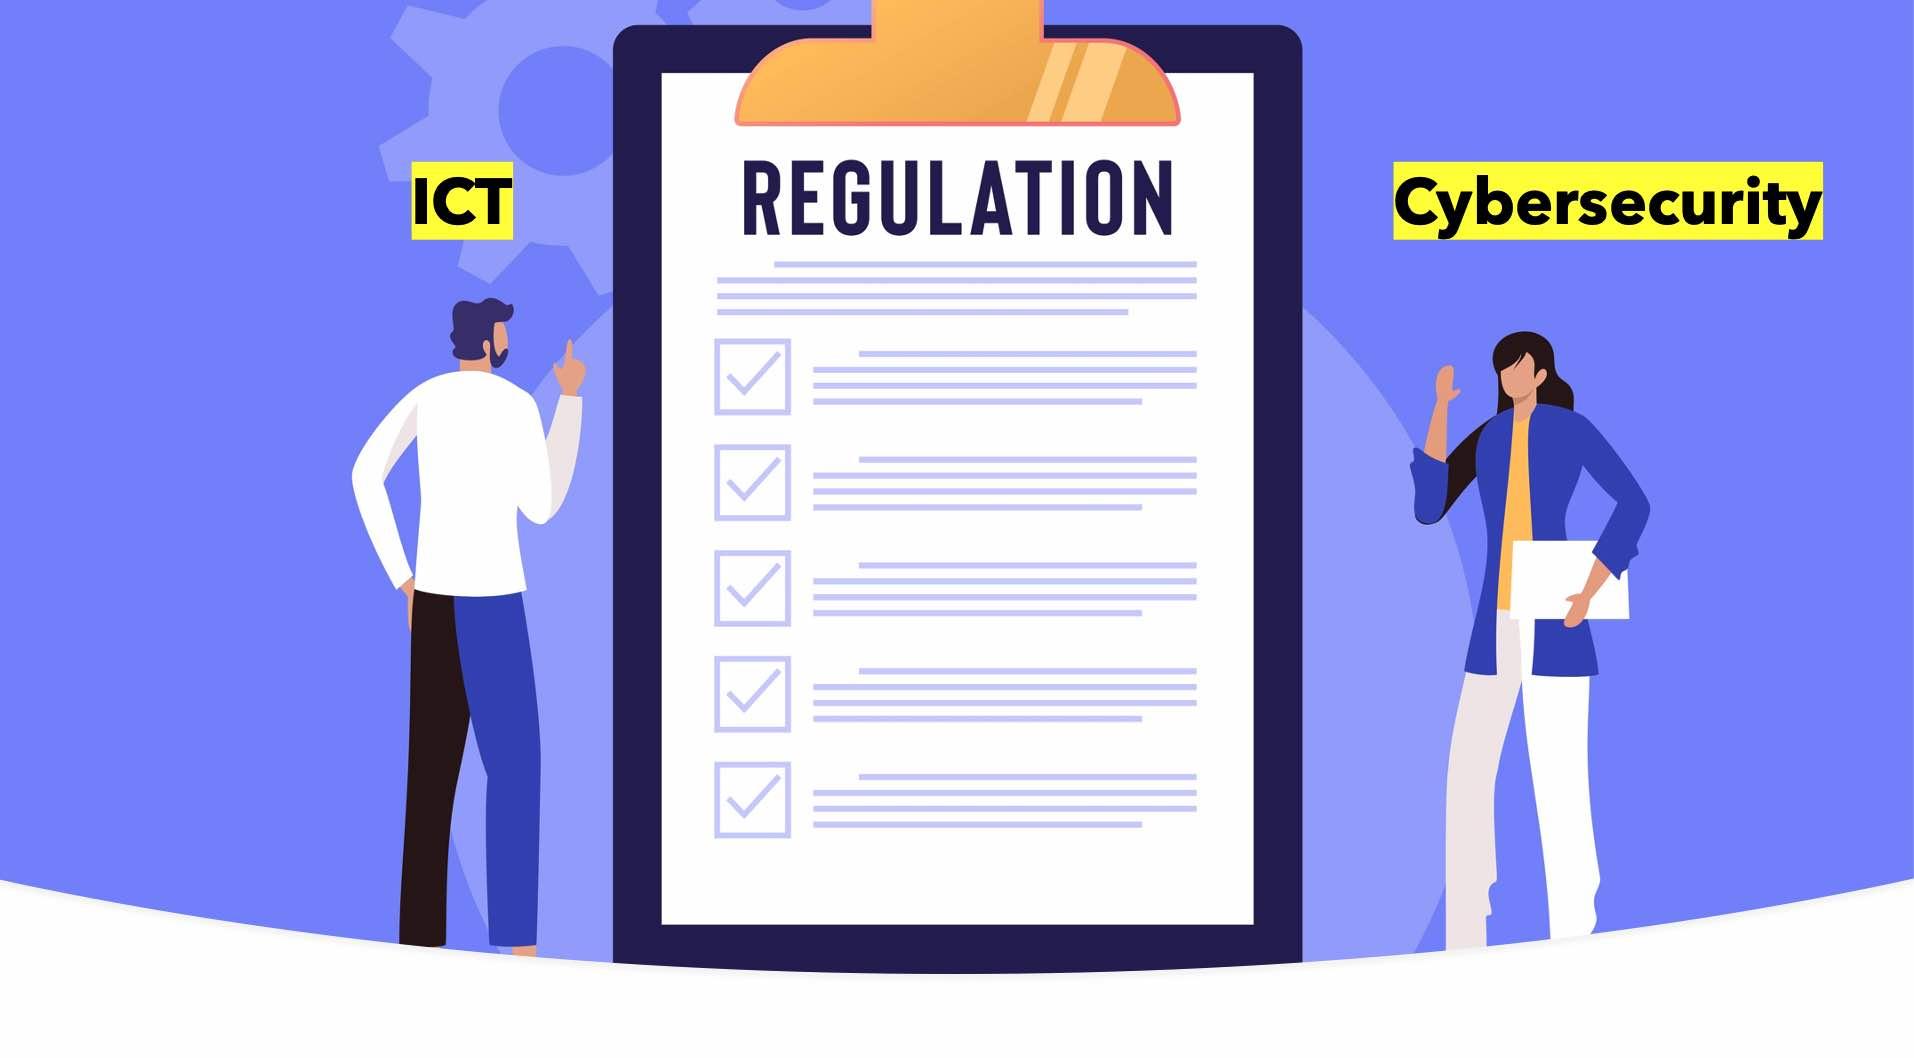 ICT & Cybersecurity Related Regulations